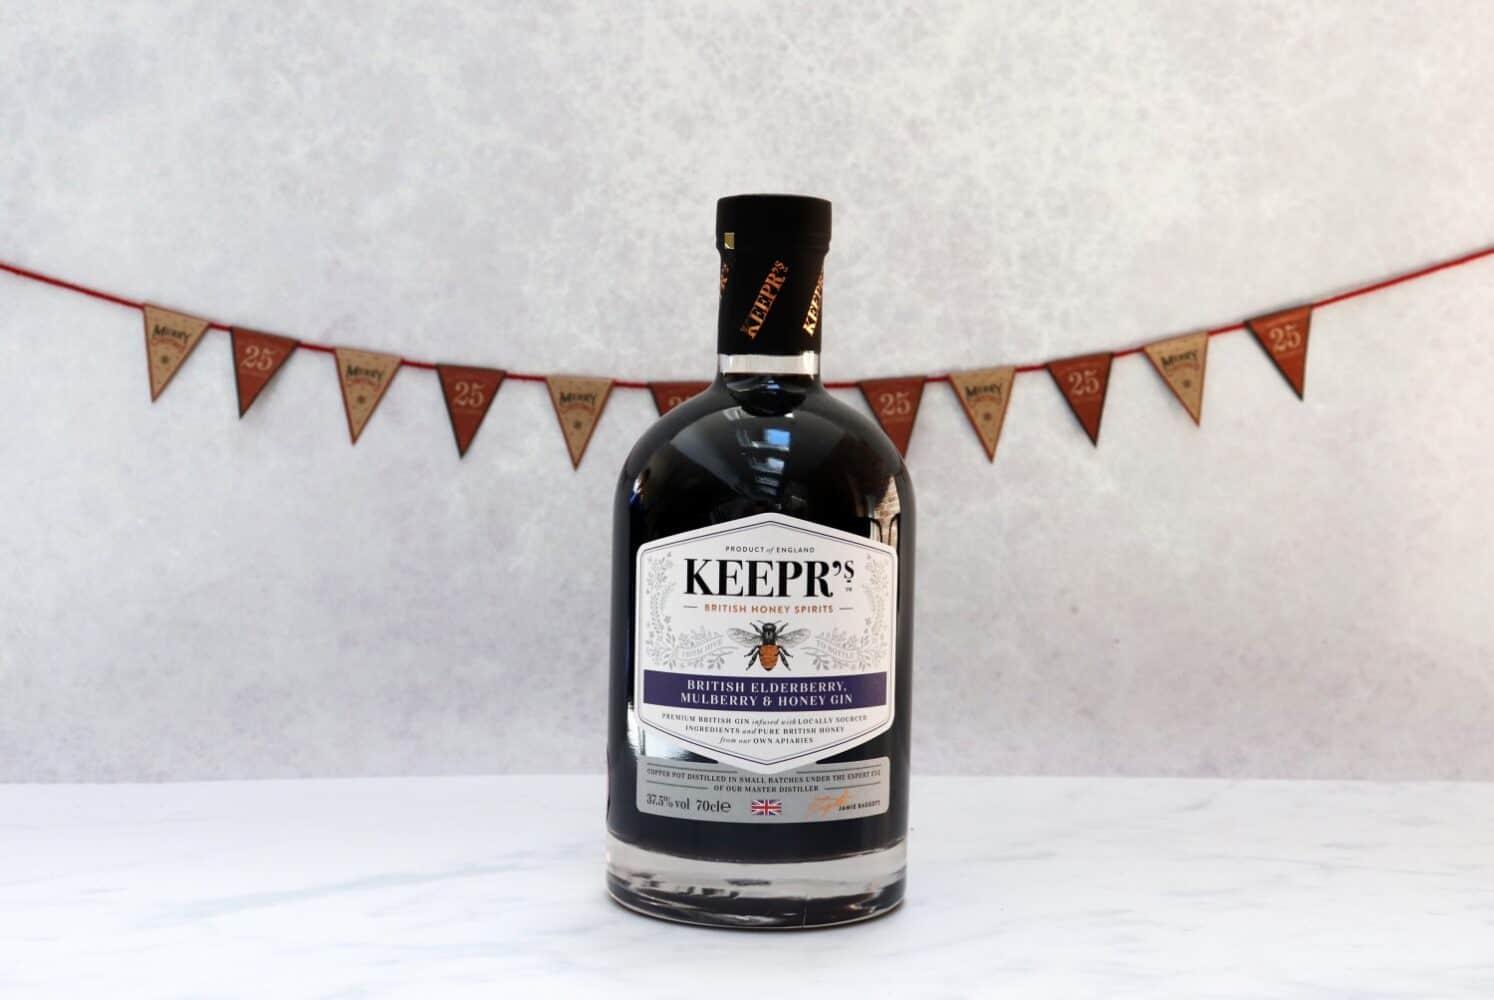 Keepr's British Elderberry, Mulberry and Honey Gin